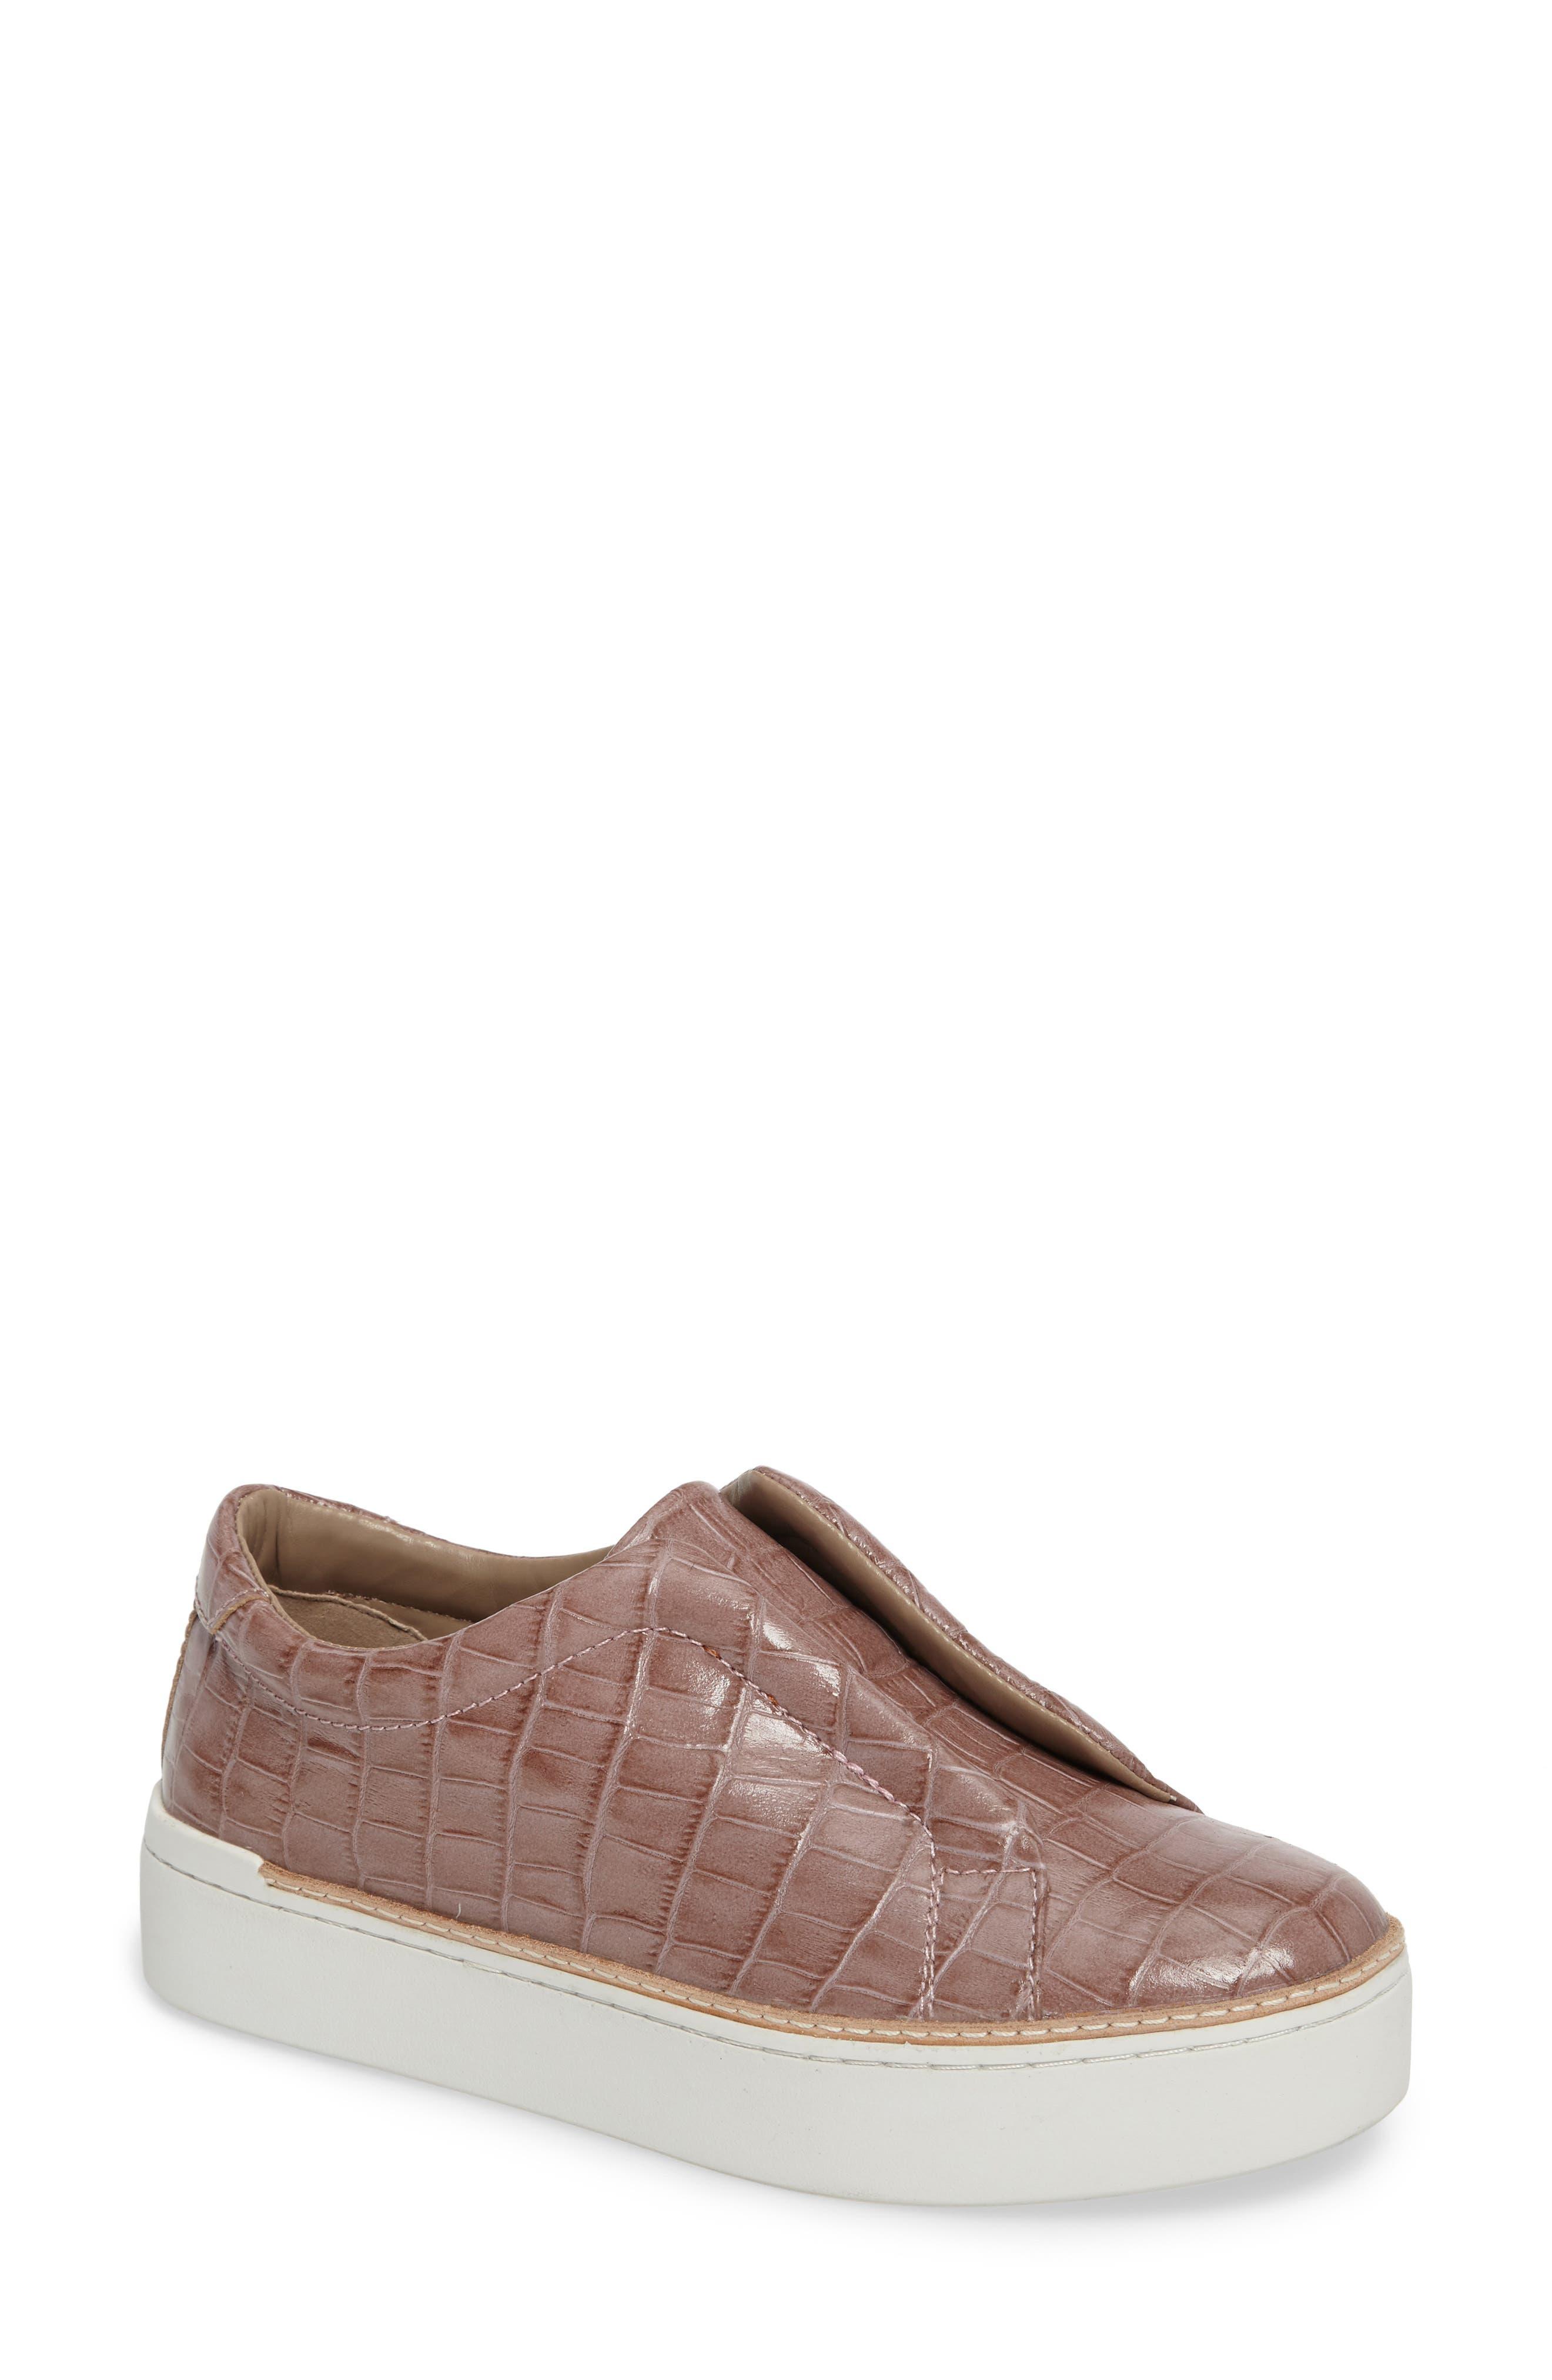 M4D3 Super Slip-On Sneaker- Pink